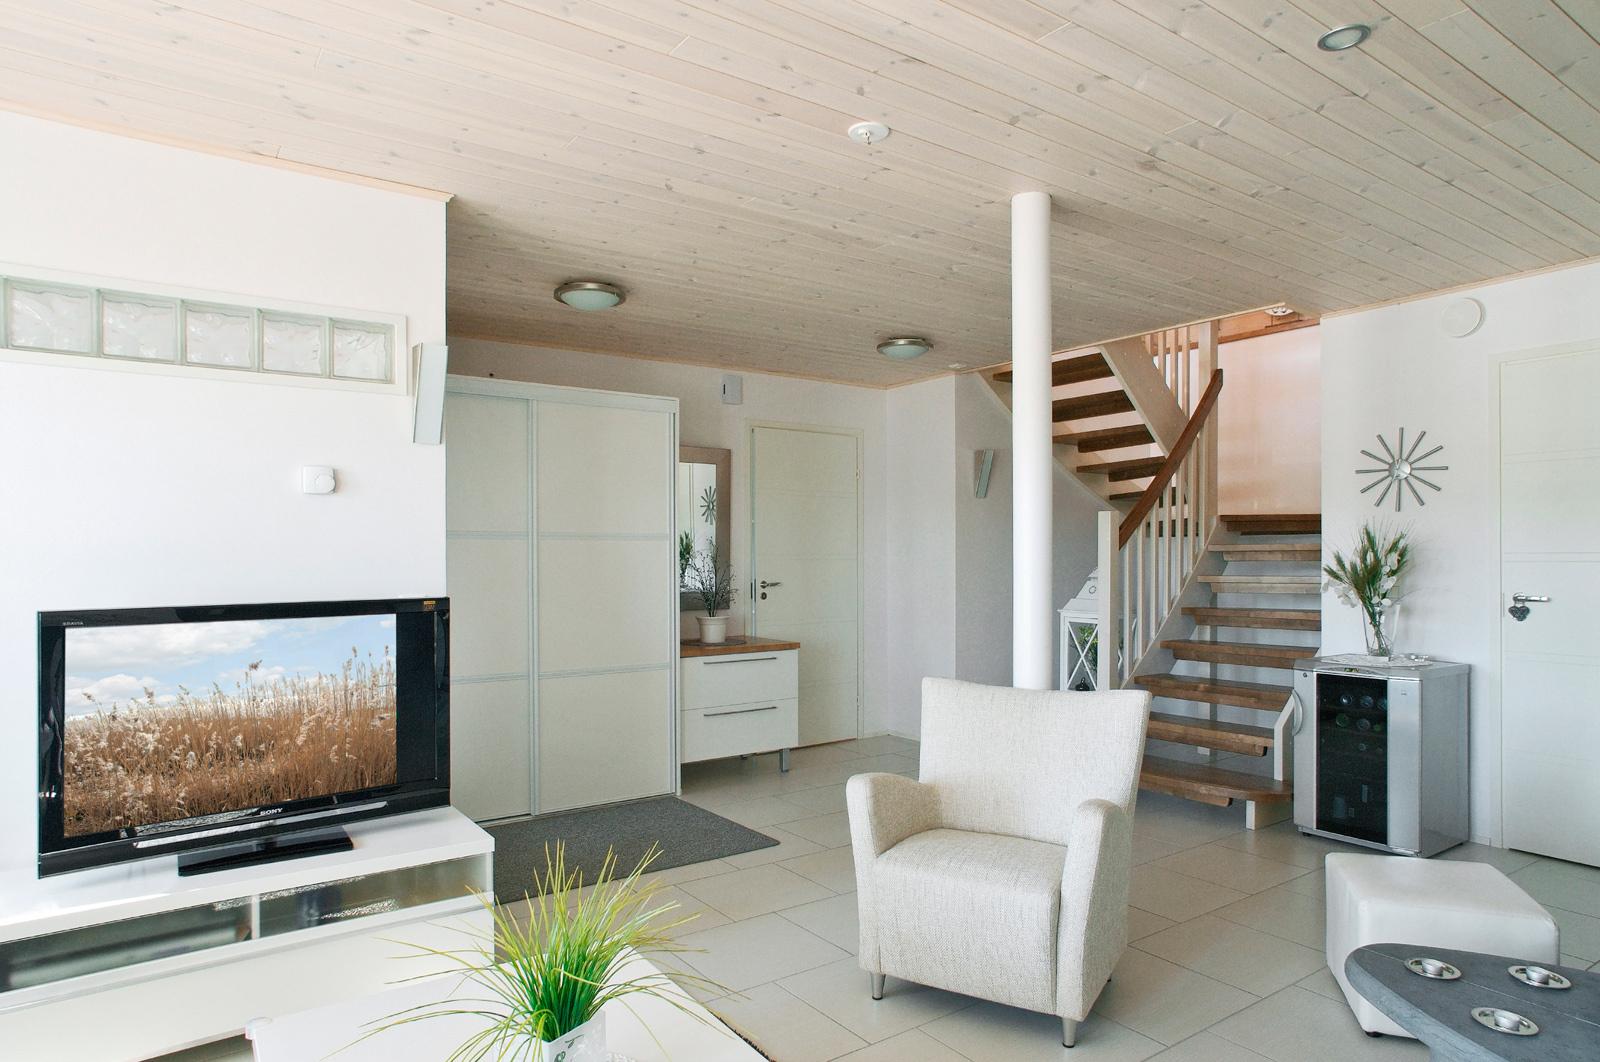 Kontio - Interiors